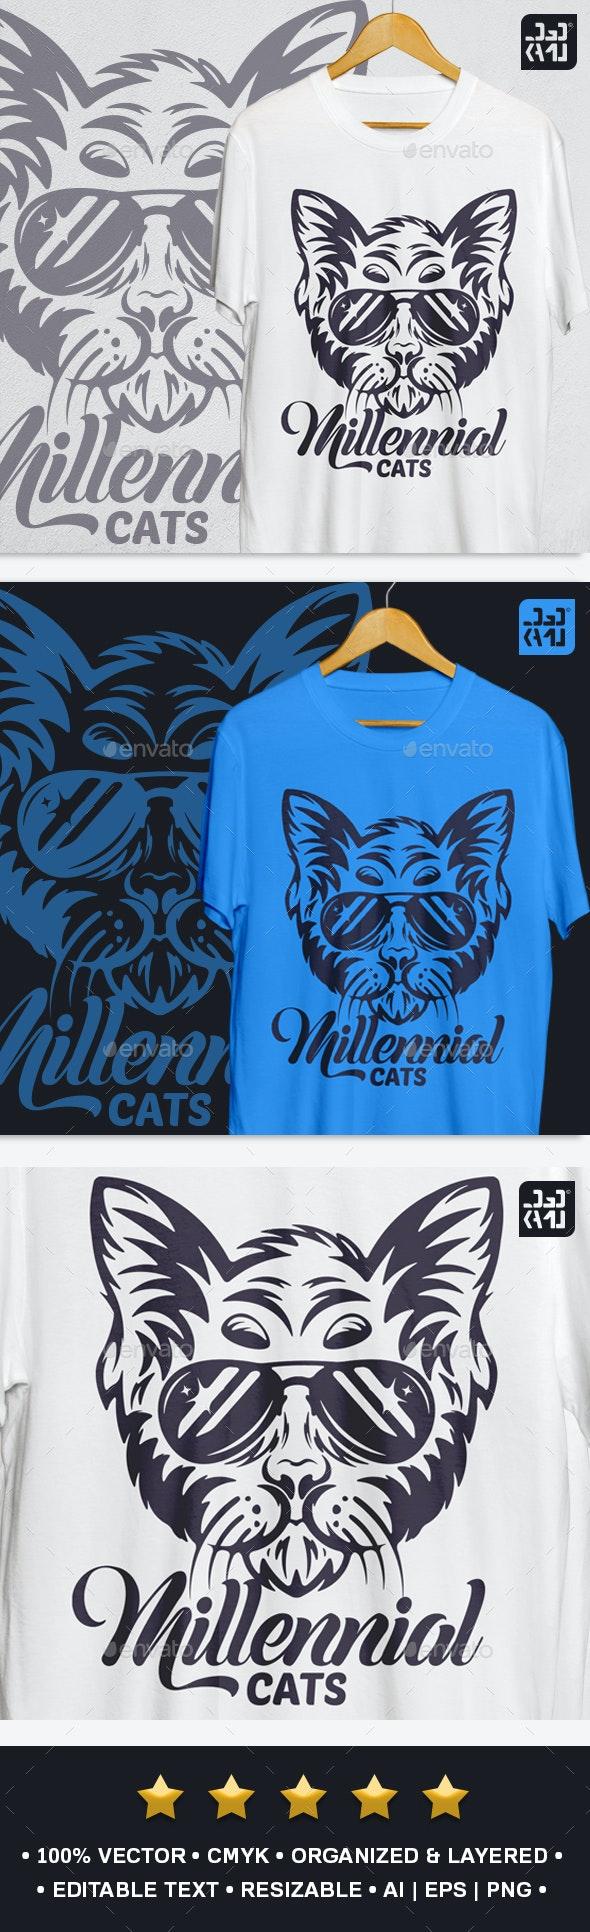 Millennial Cats T-Shirt - Funny Designs